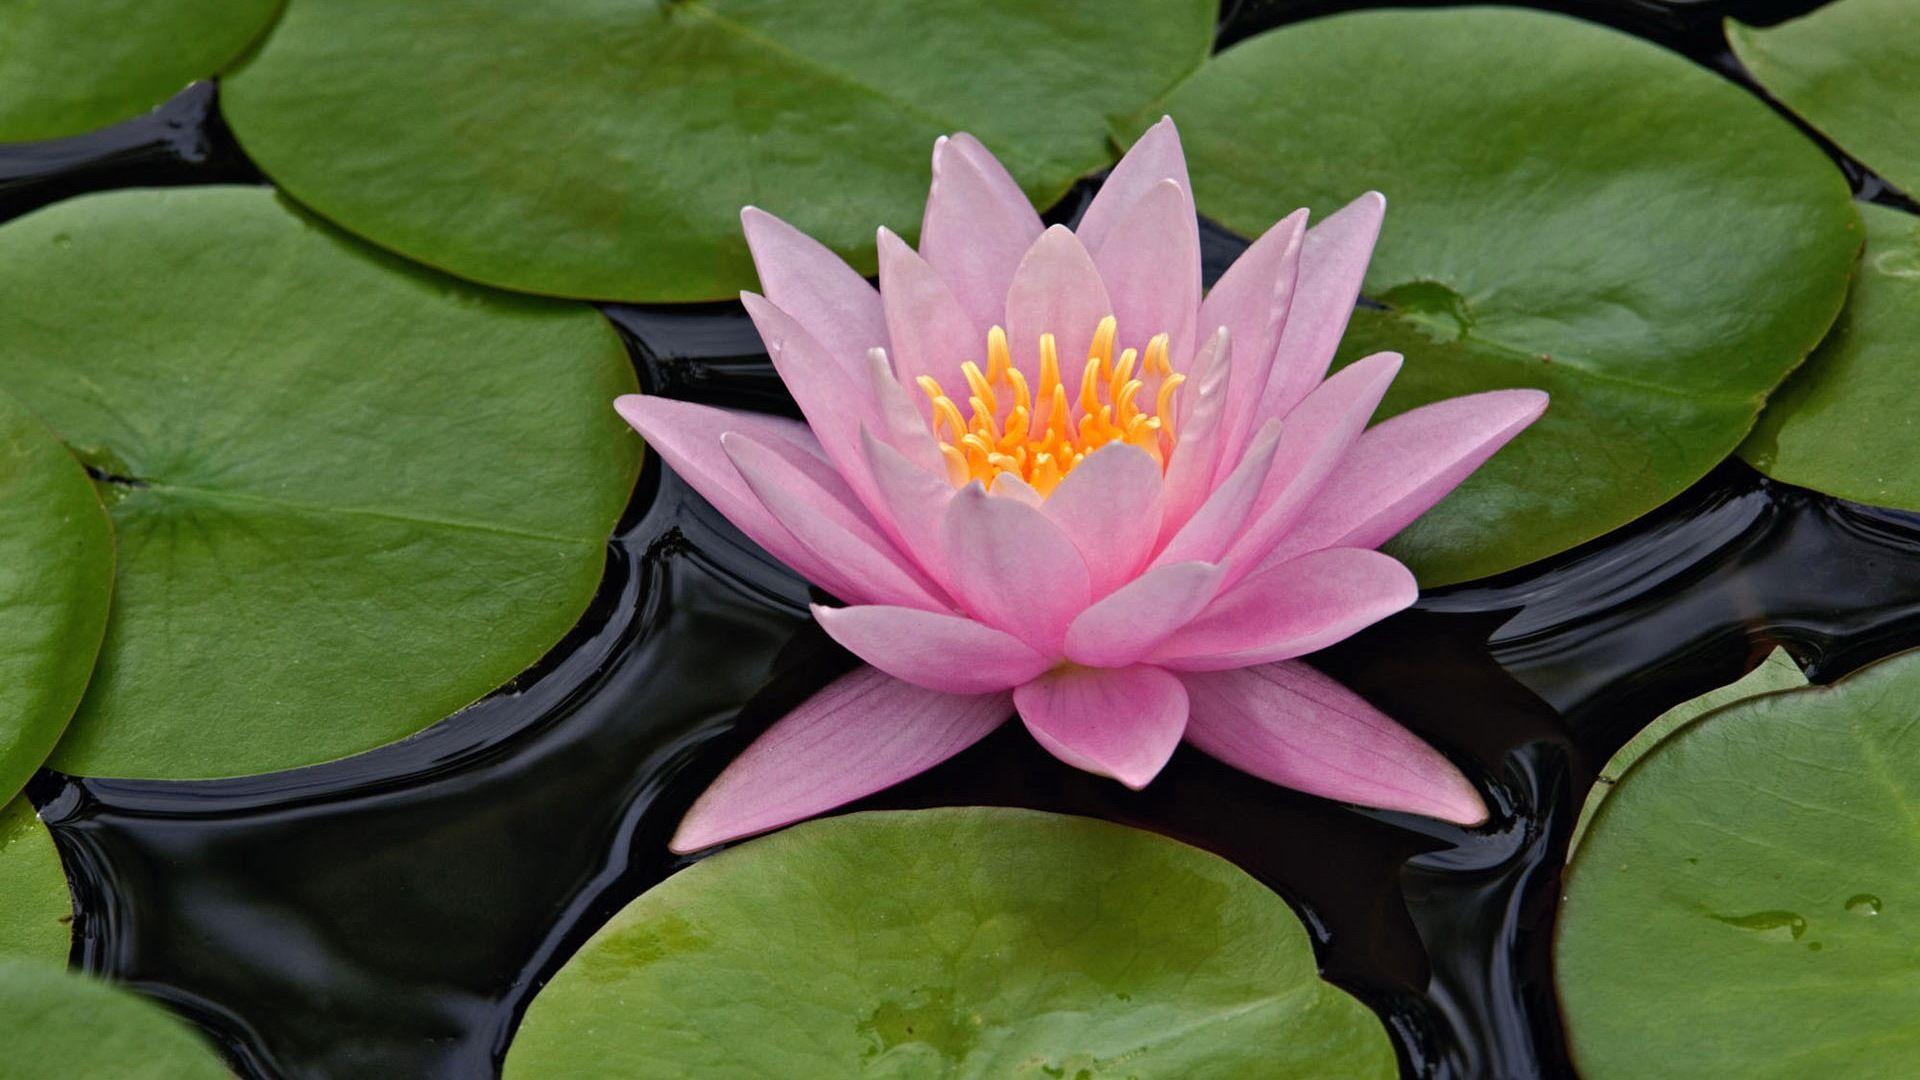 Lotus Flower Hd Wallpaper Lotus Flower Pictures New